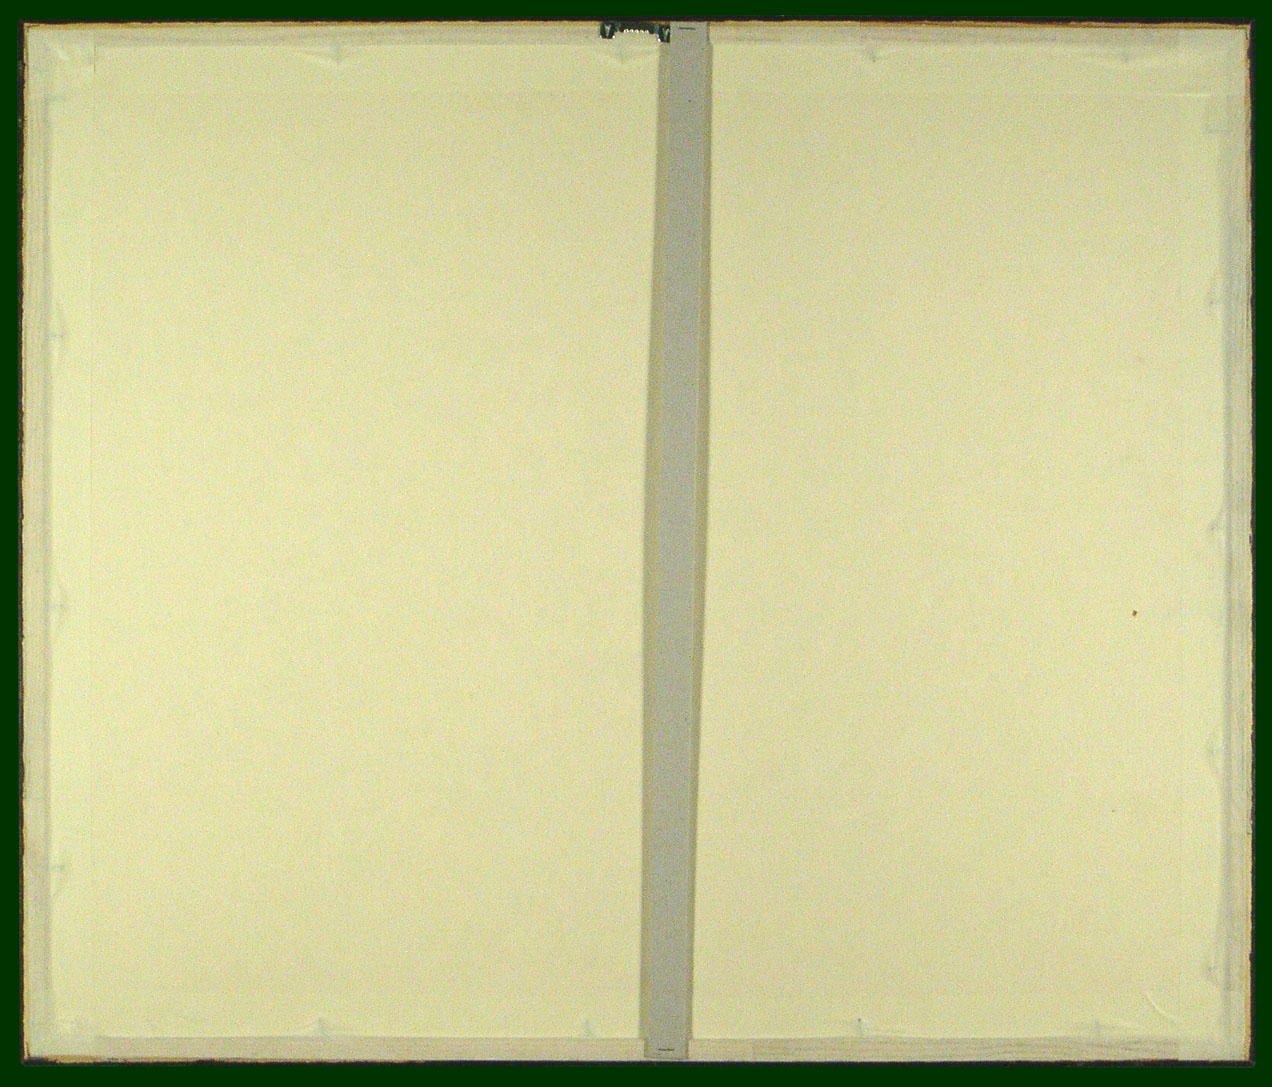 62-15hat.JPG (1272×1087)